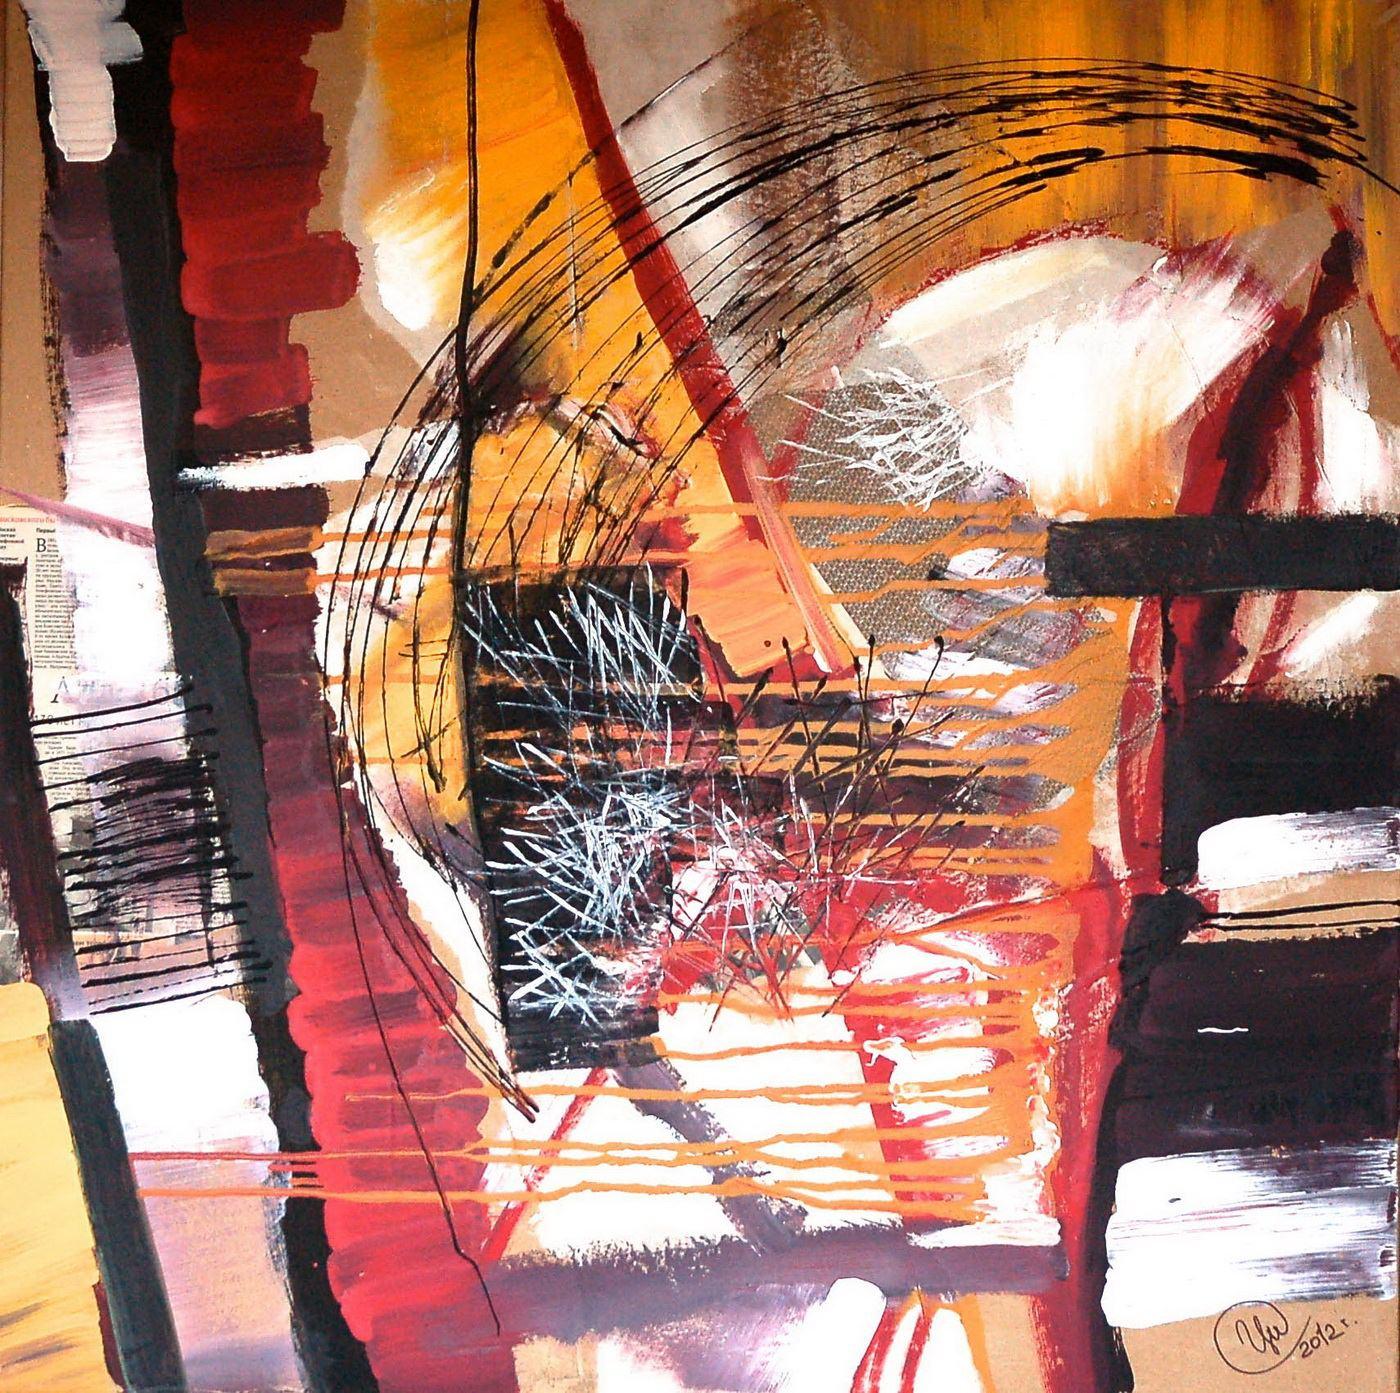 Евгений Ципулин. Координаты звука, диптих, часть -2, 2012. Холст, акрил, 100х100 Courtesy of the East Meets West Gallery